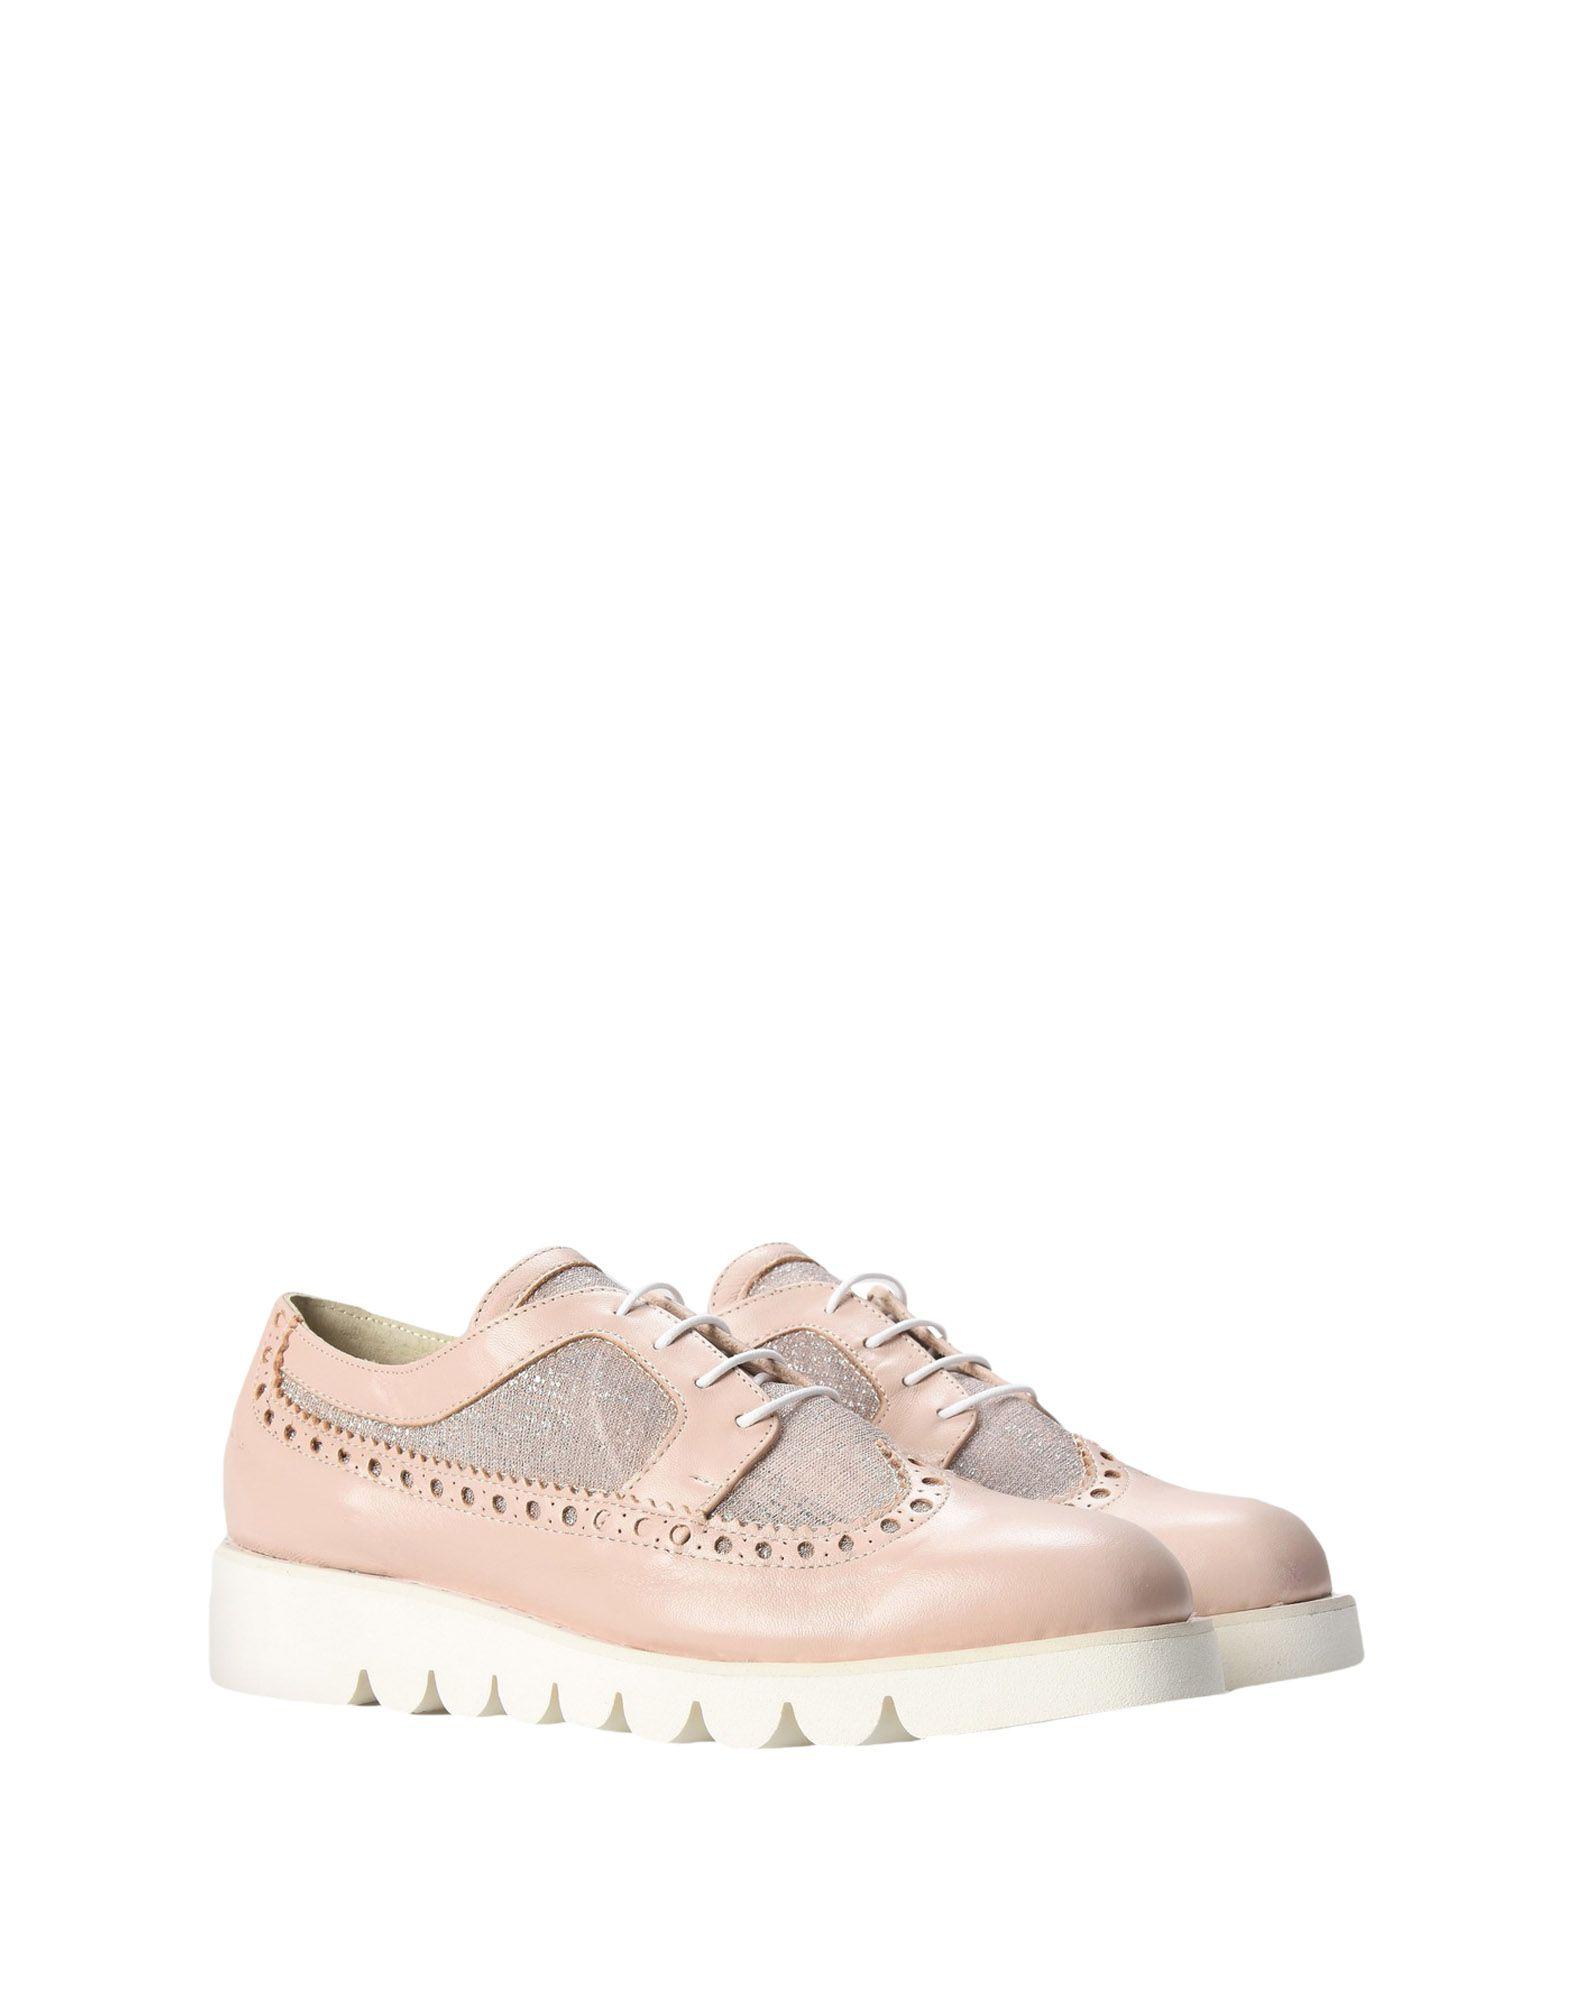 Giordana F. Schnürschuhe Damen  11458391AJ Gute Qualität beliebte beliebte Qualität Schuhe ca62cb